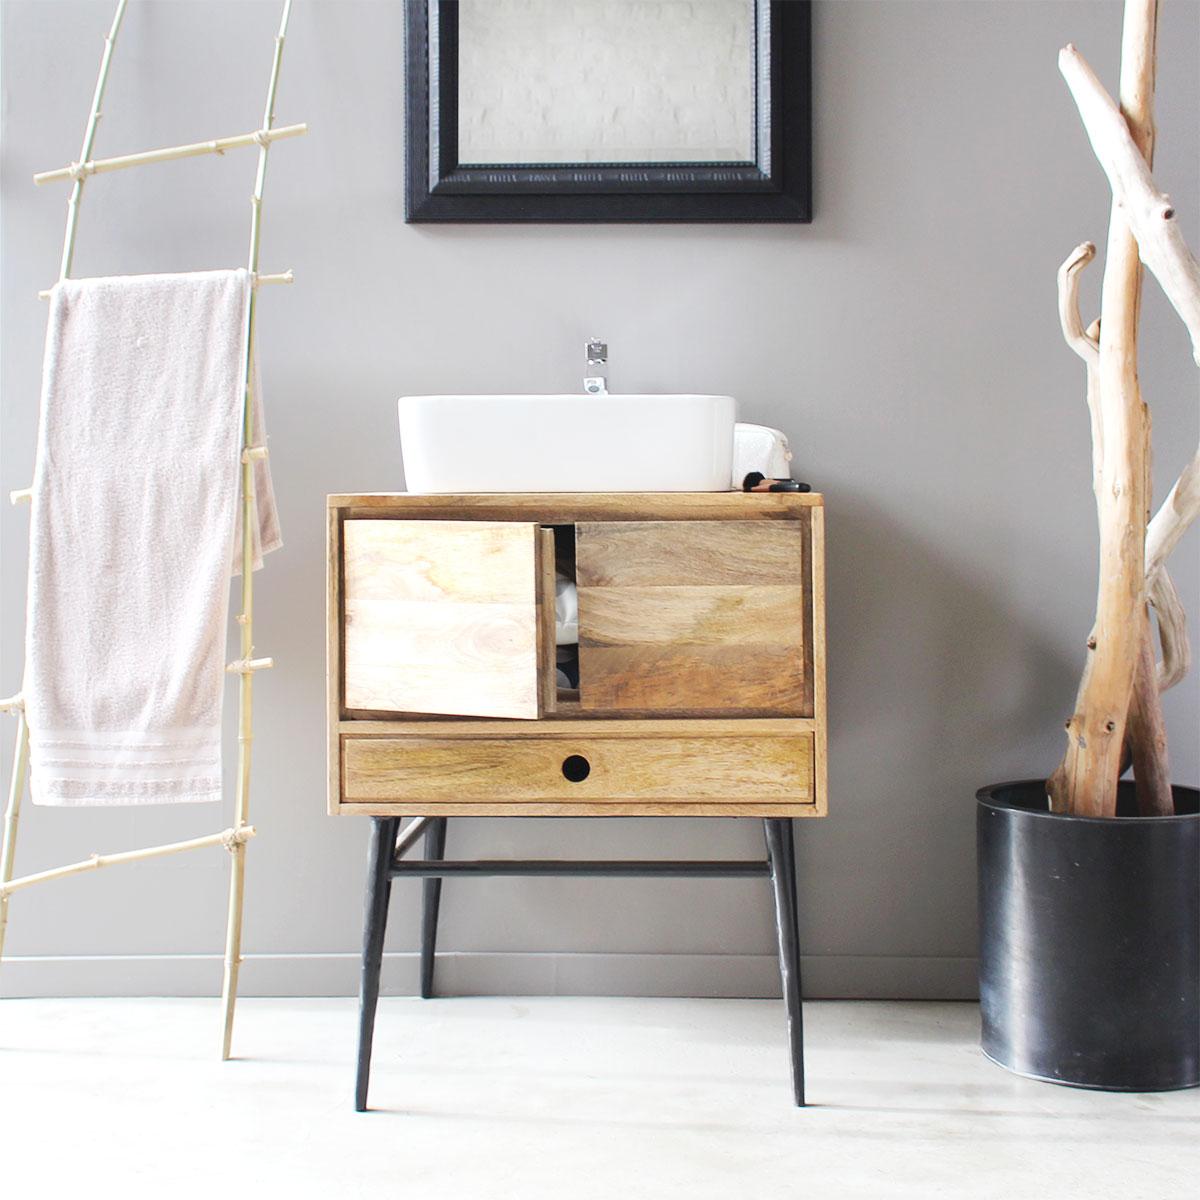 meuble sdb industriel bois metal noir retro